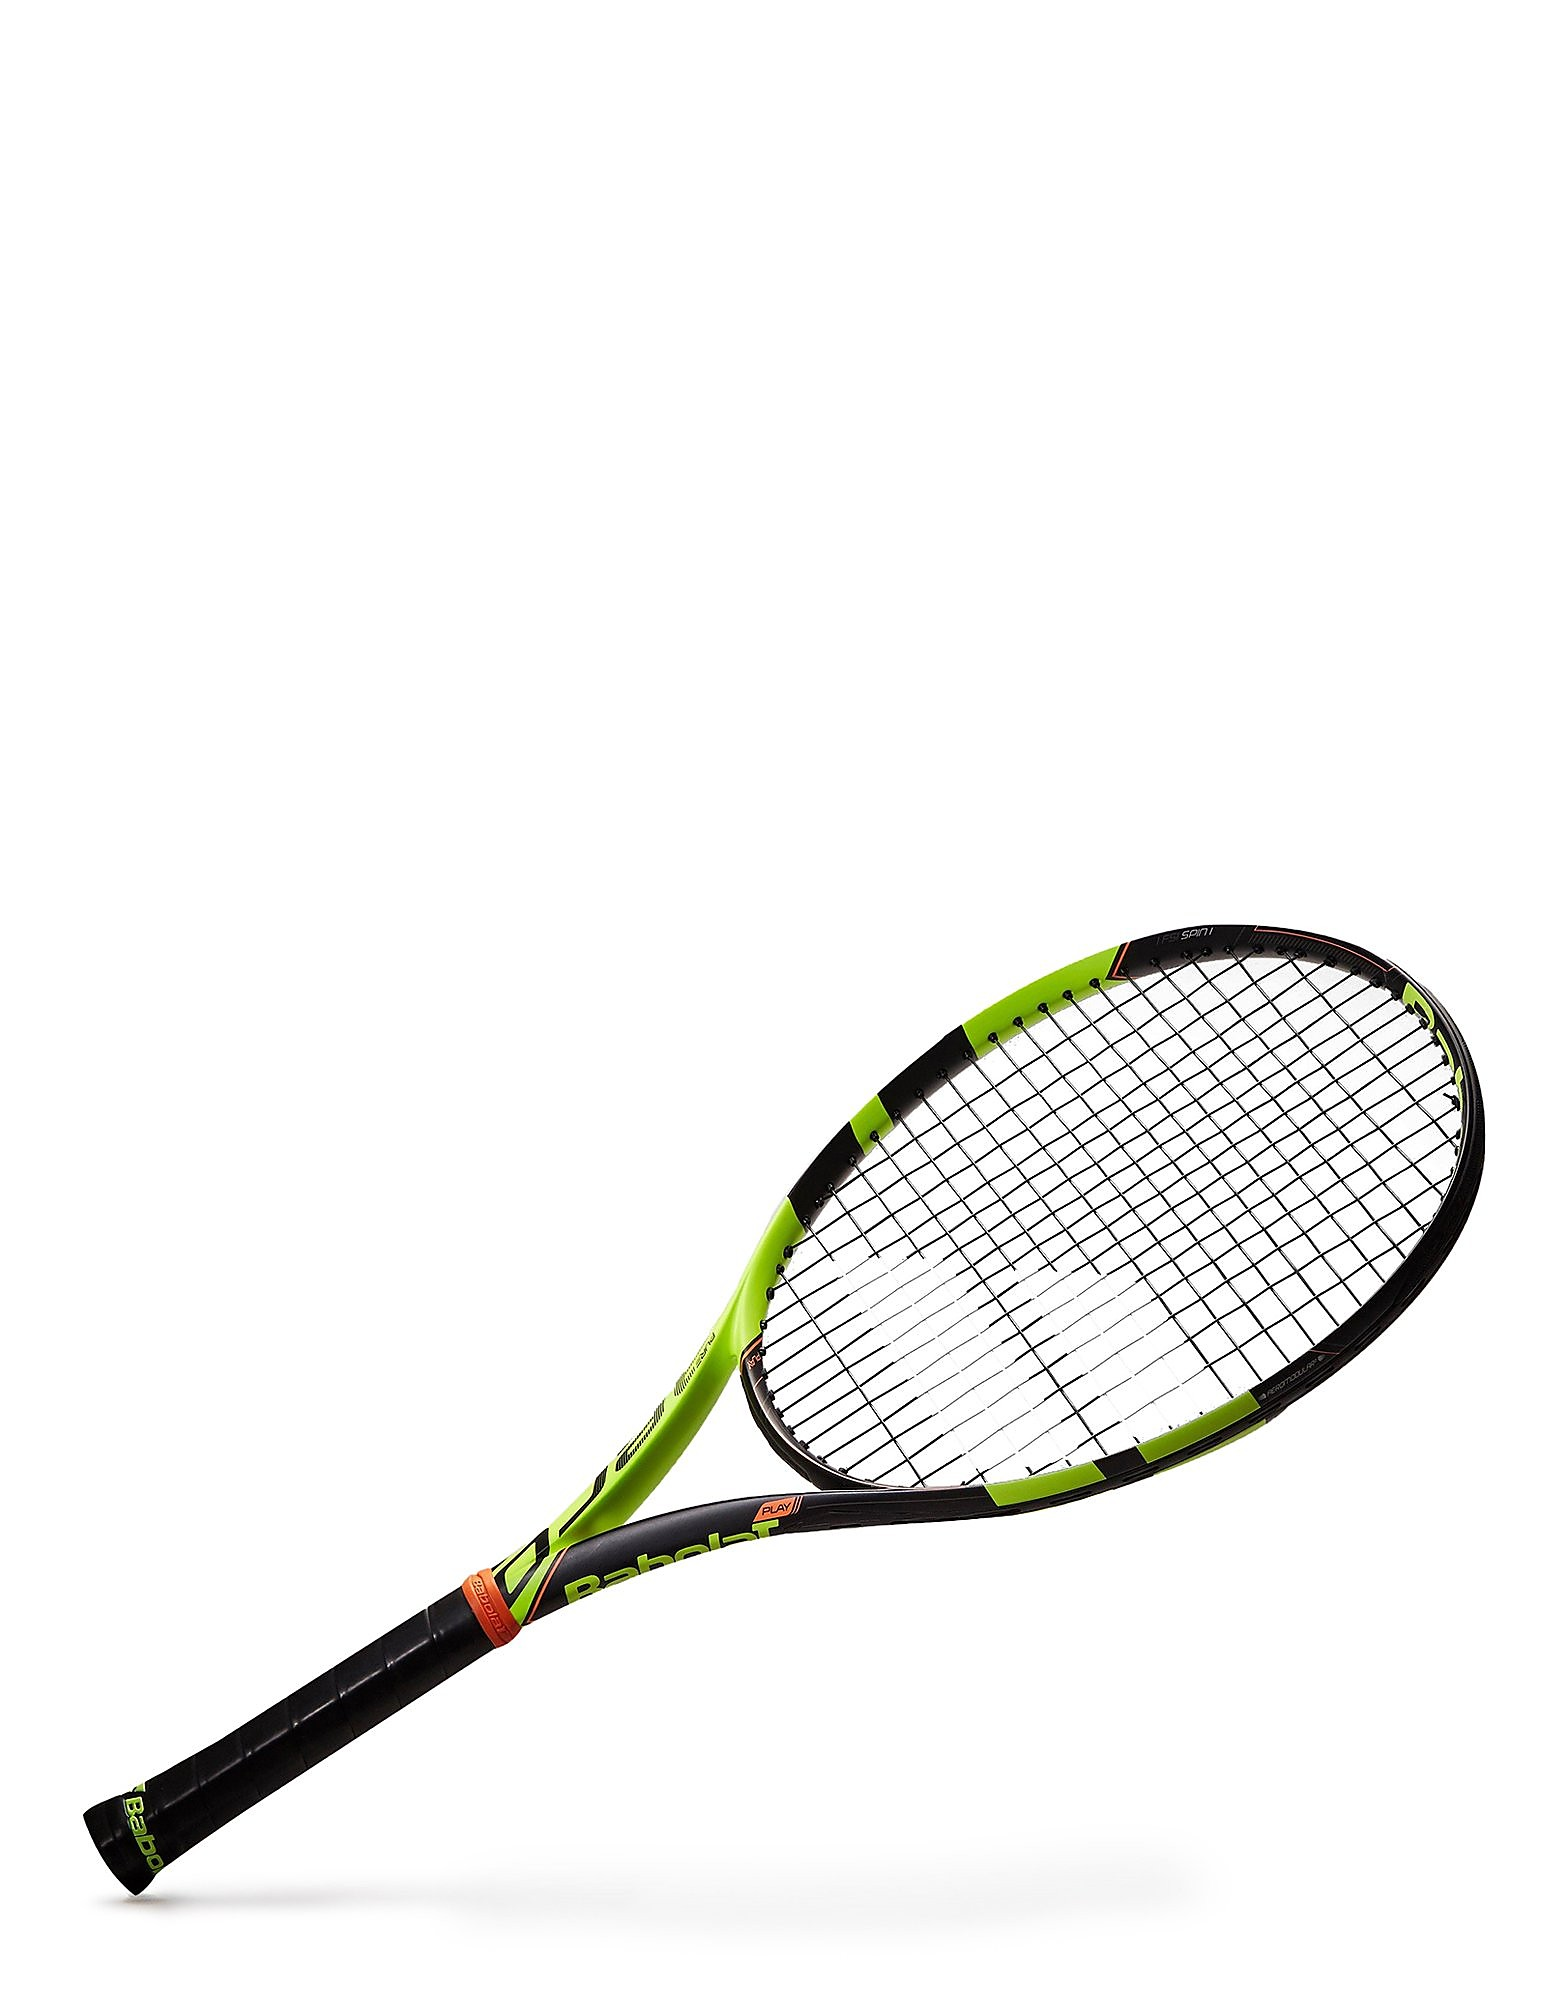 Babolat Pure Aero Play Strung Tennis Racket